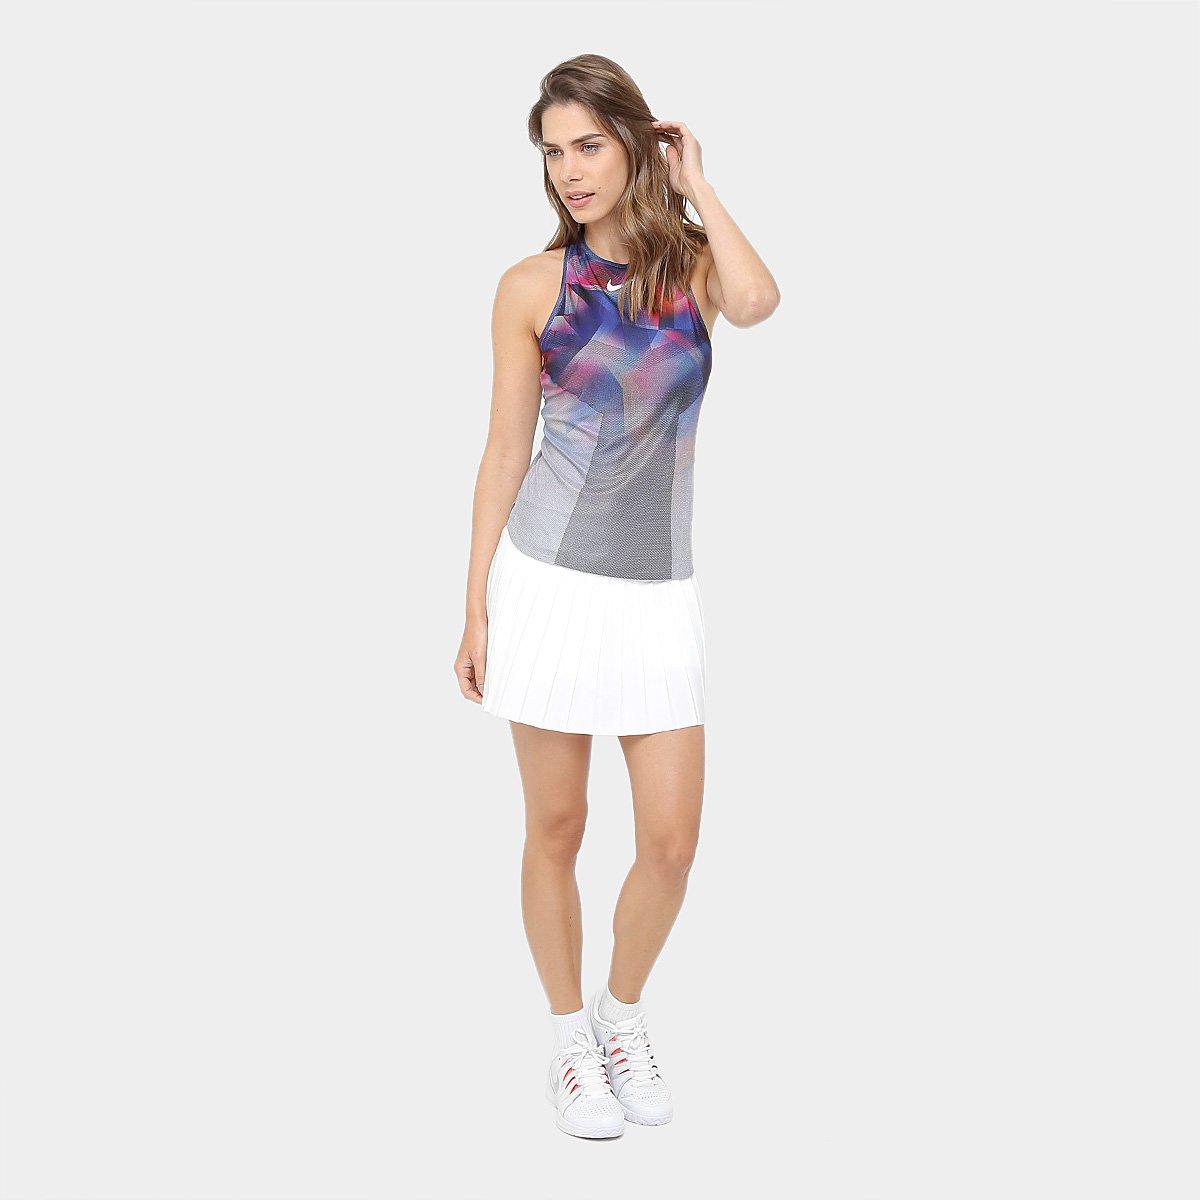 Regata Grafite Azul e Dry Camiseta US Nike NT Feminina dCH4Yq